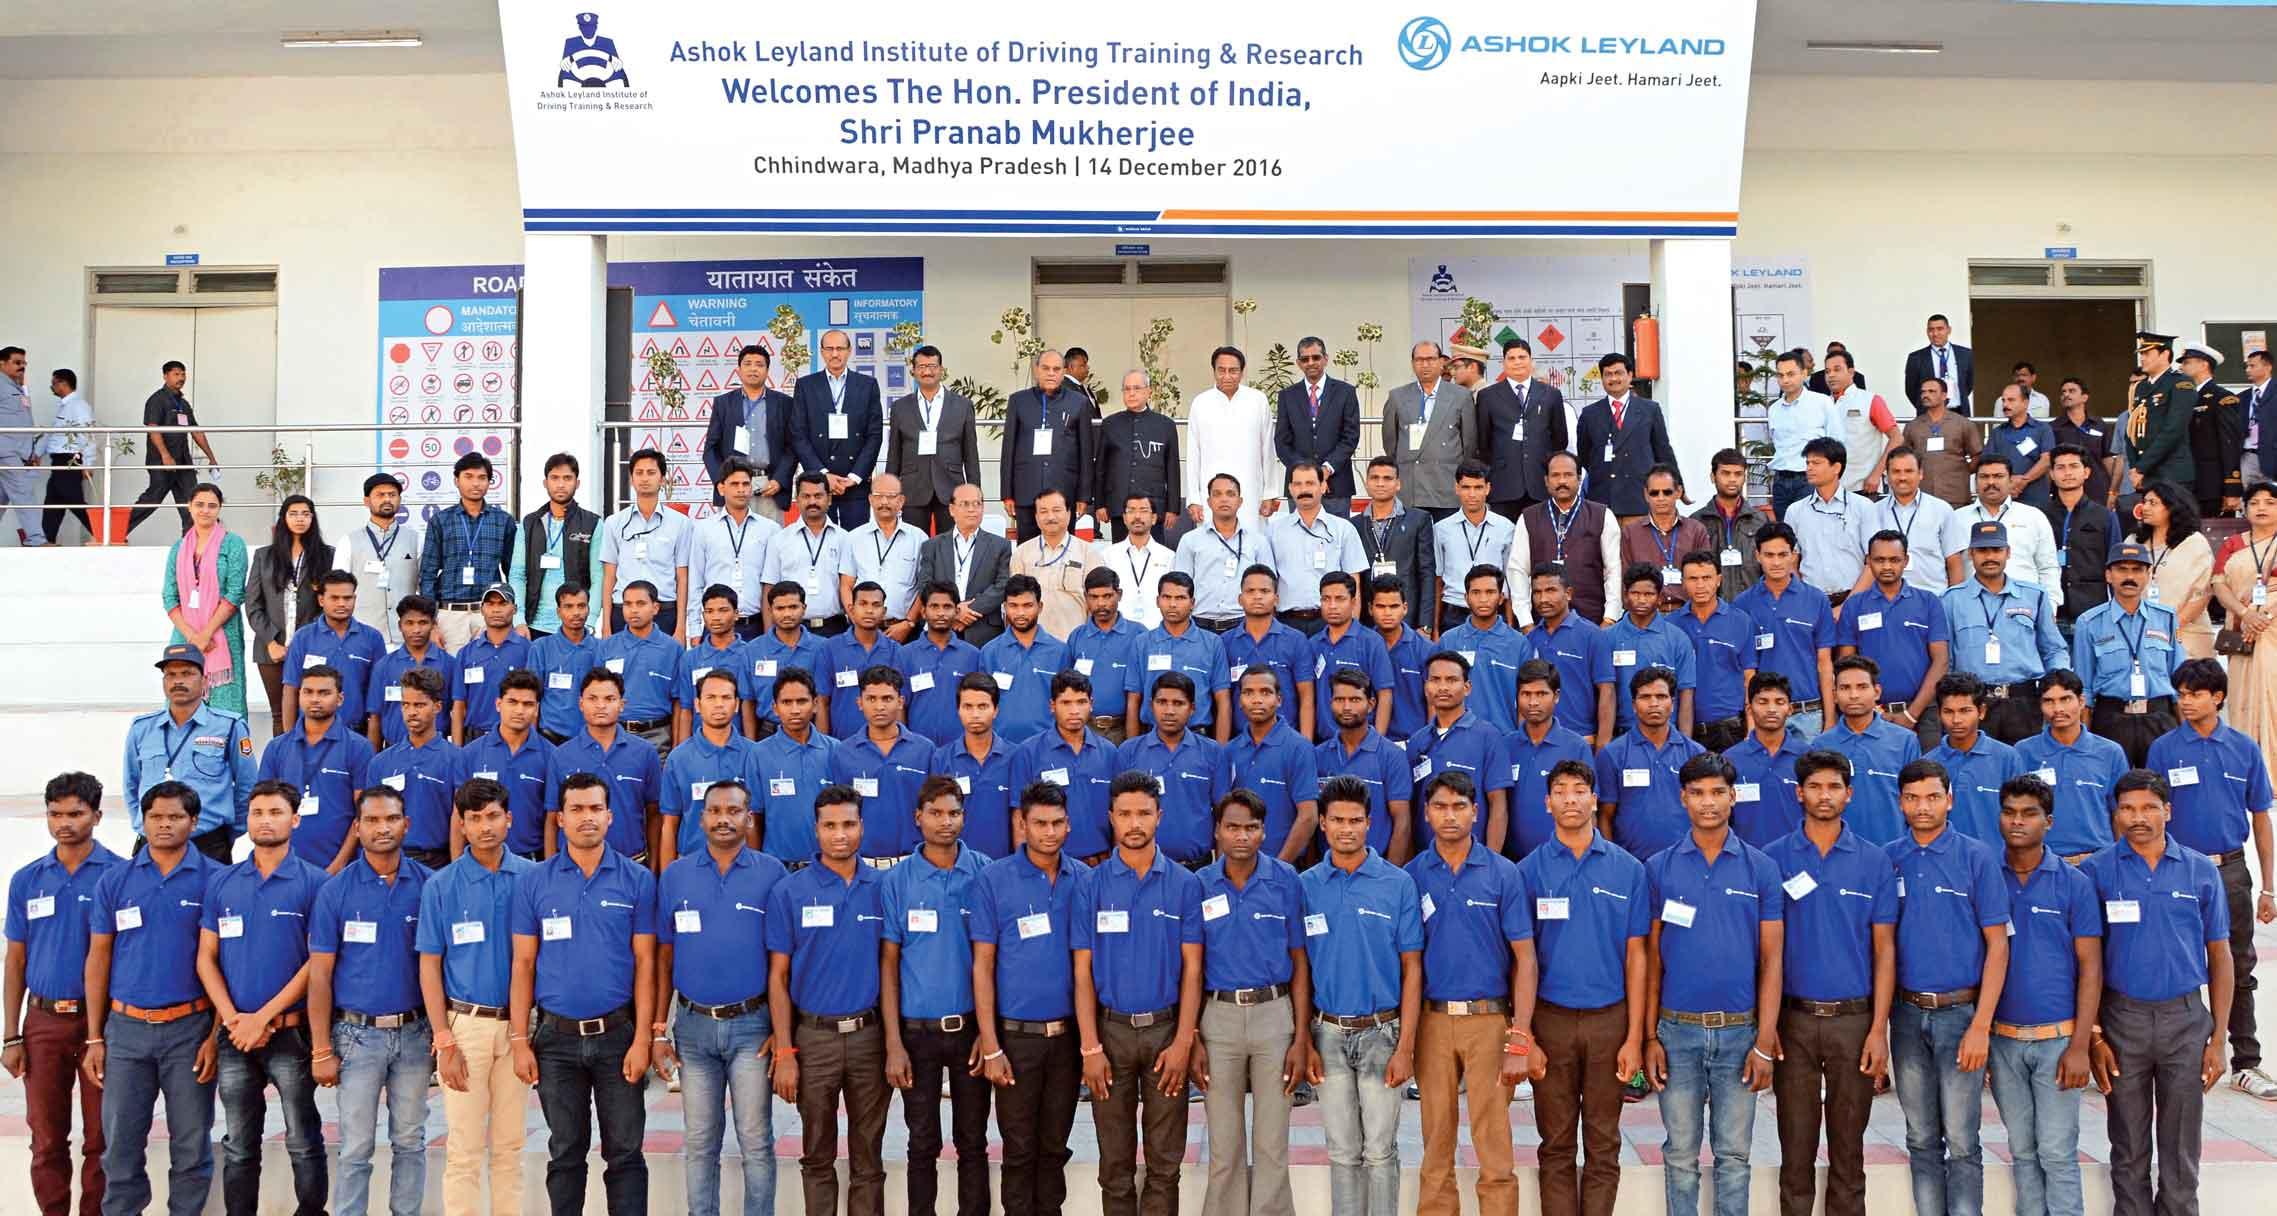 President visit's Ashok Leyland driver training institute